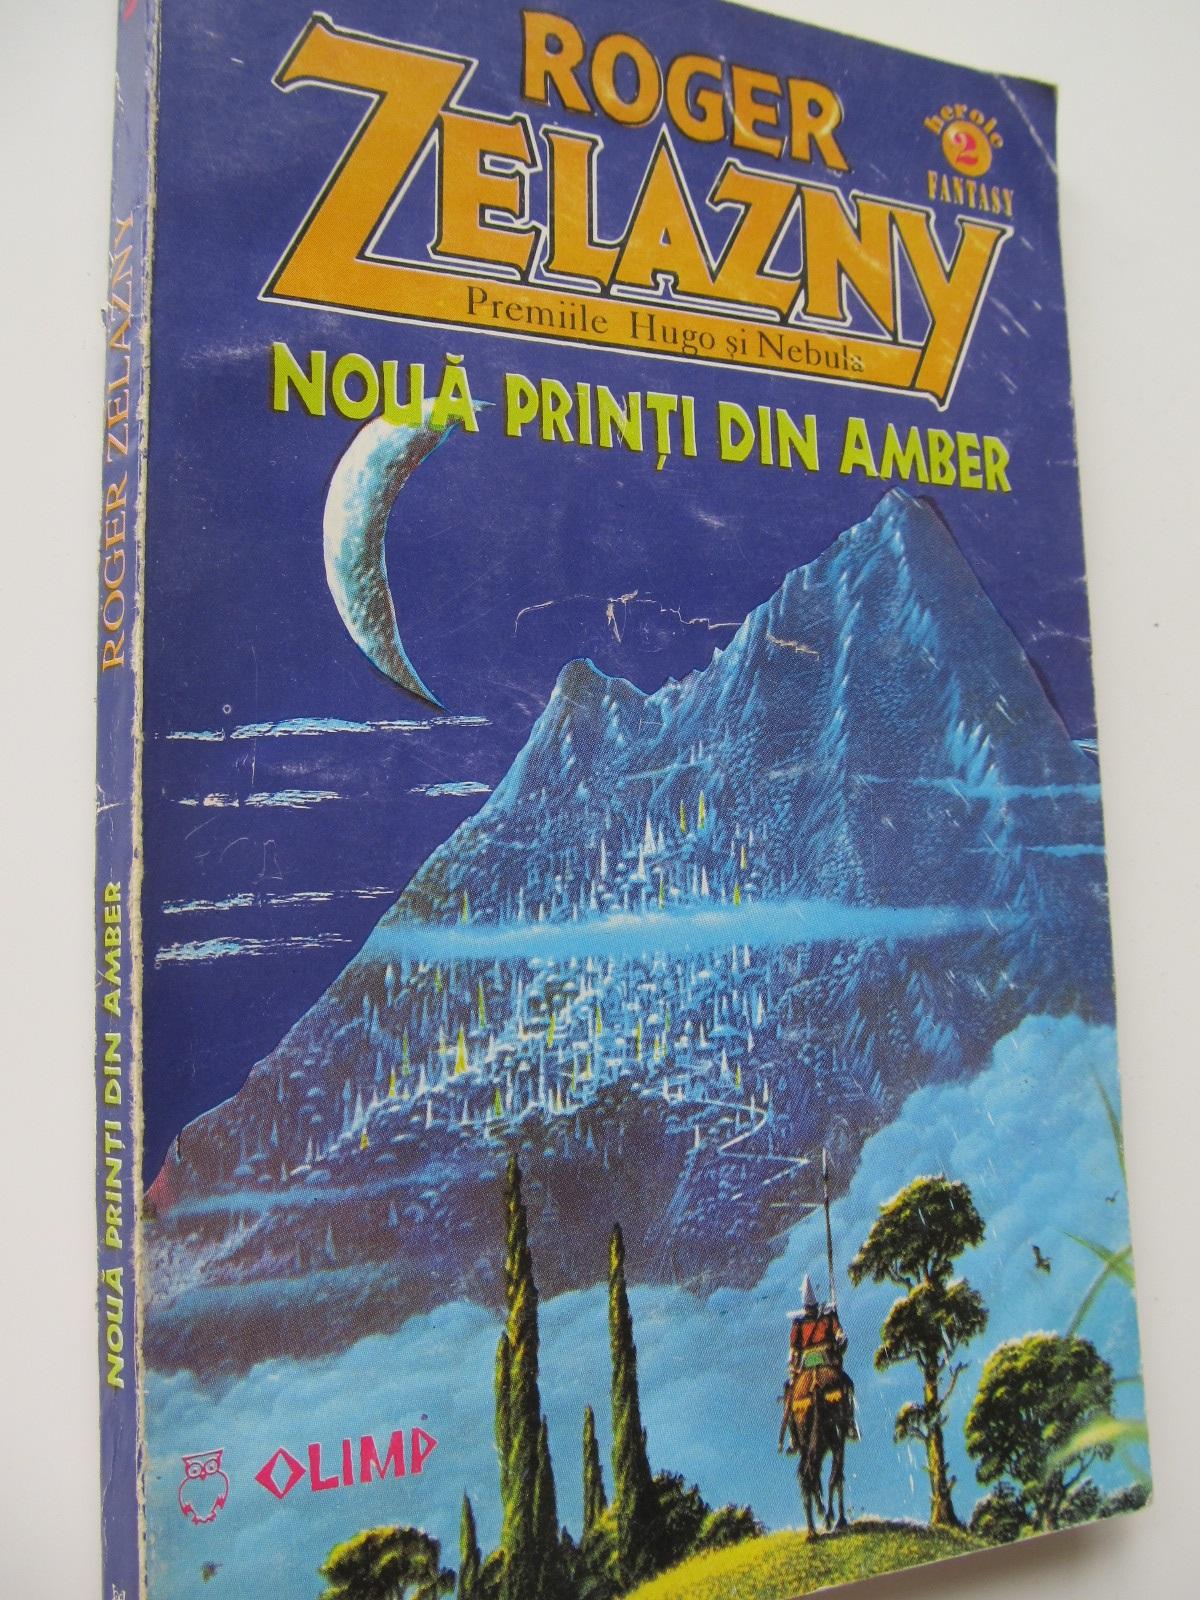 Carte Noua printi din Amber - Roger Zelazny